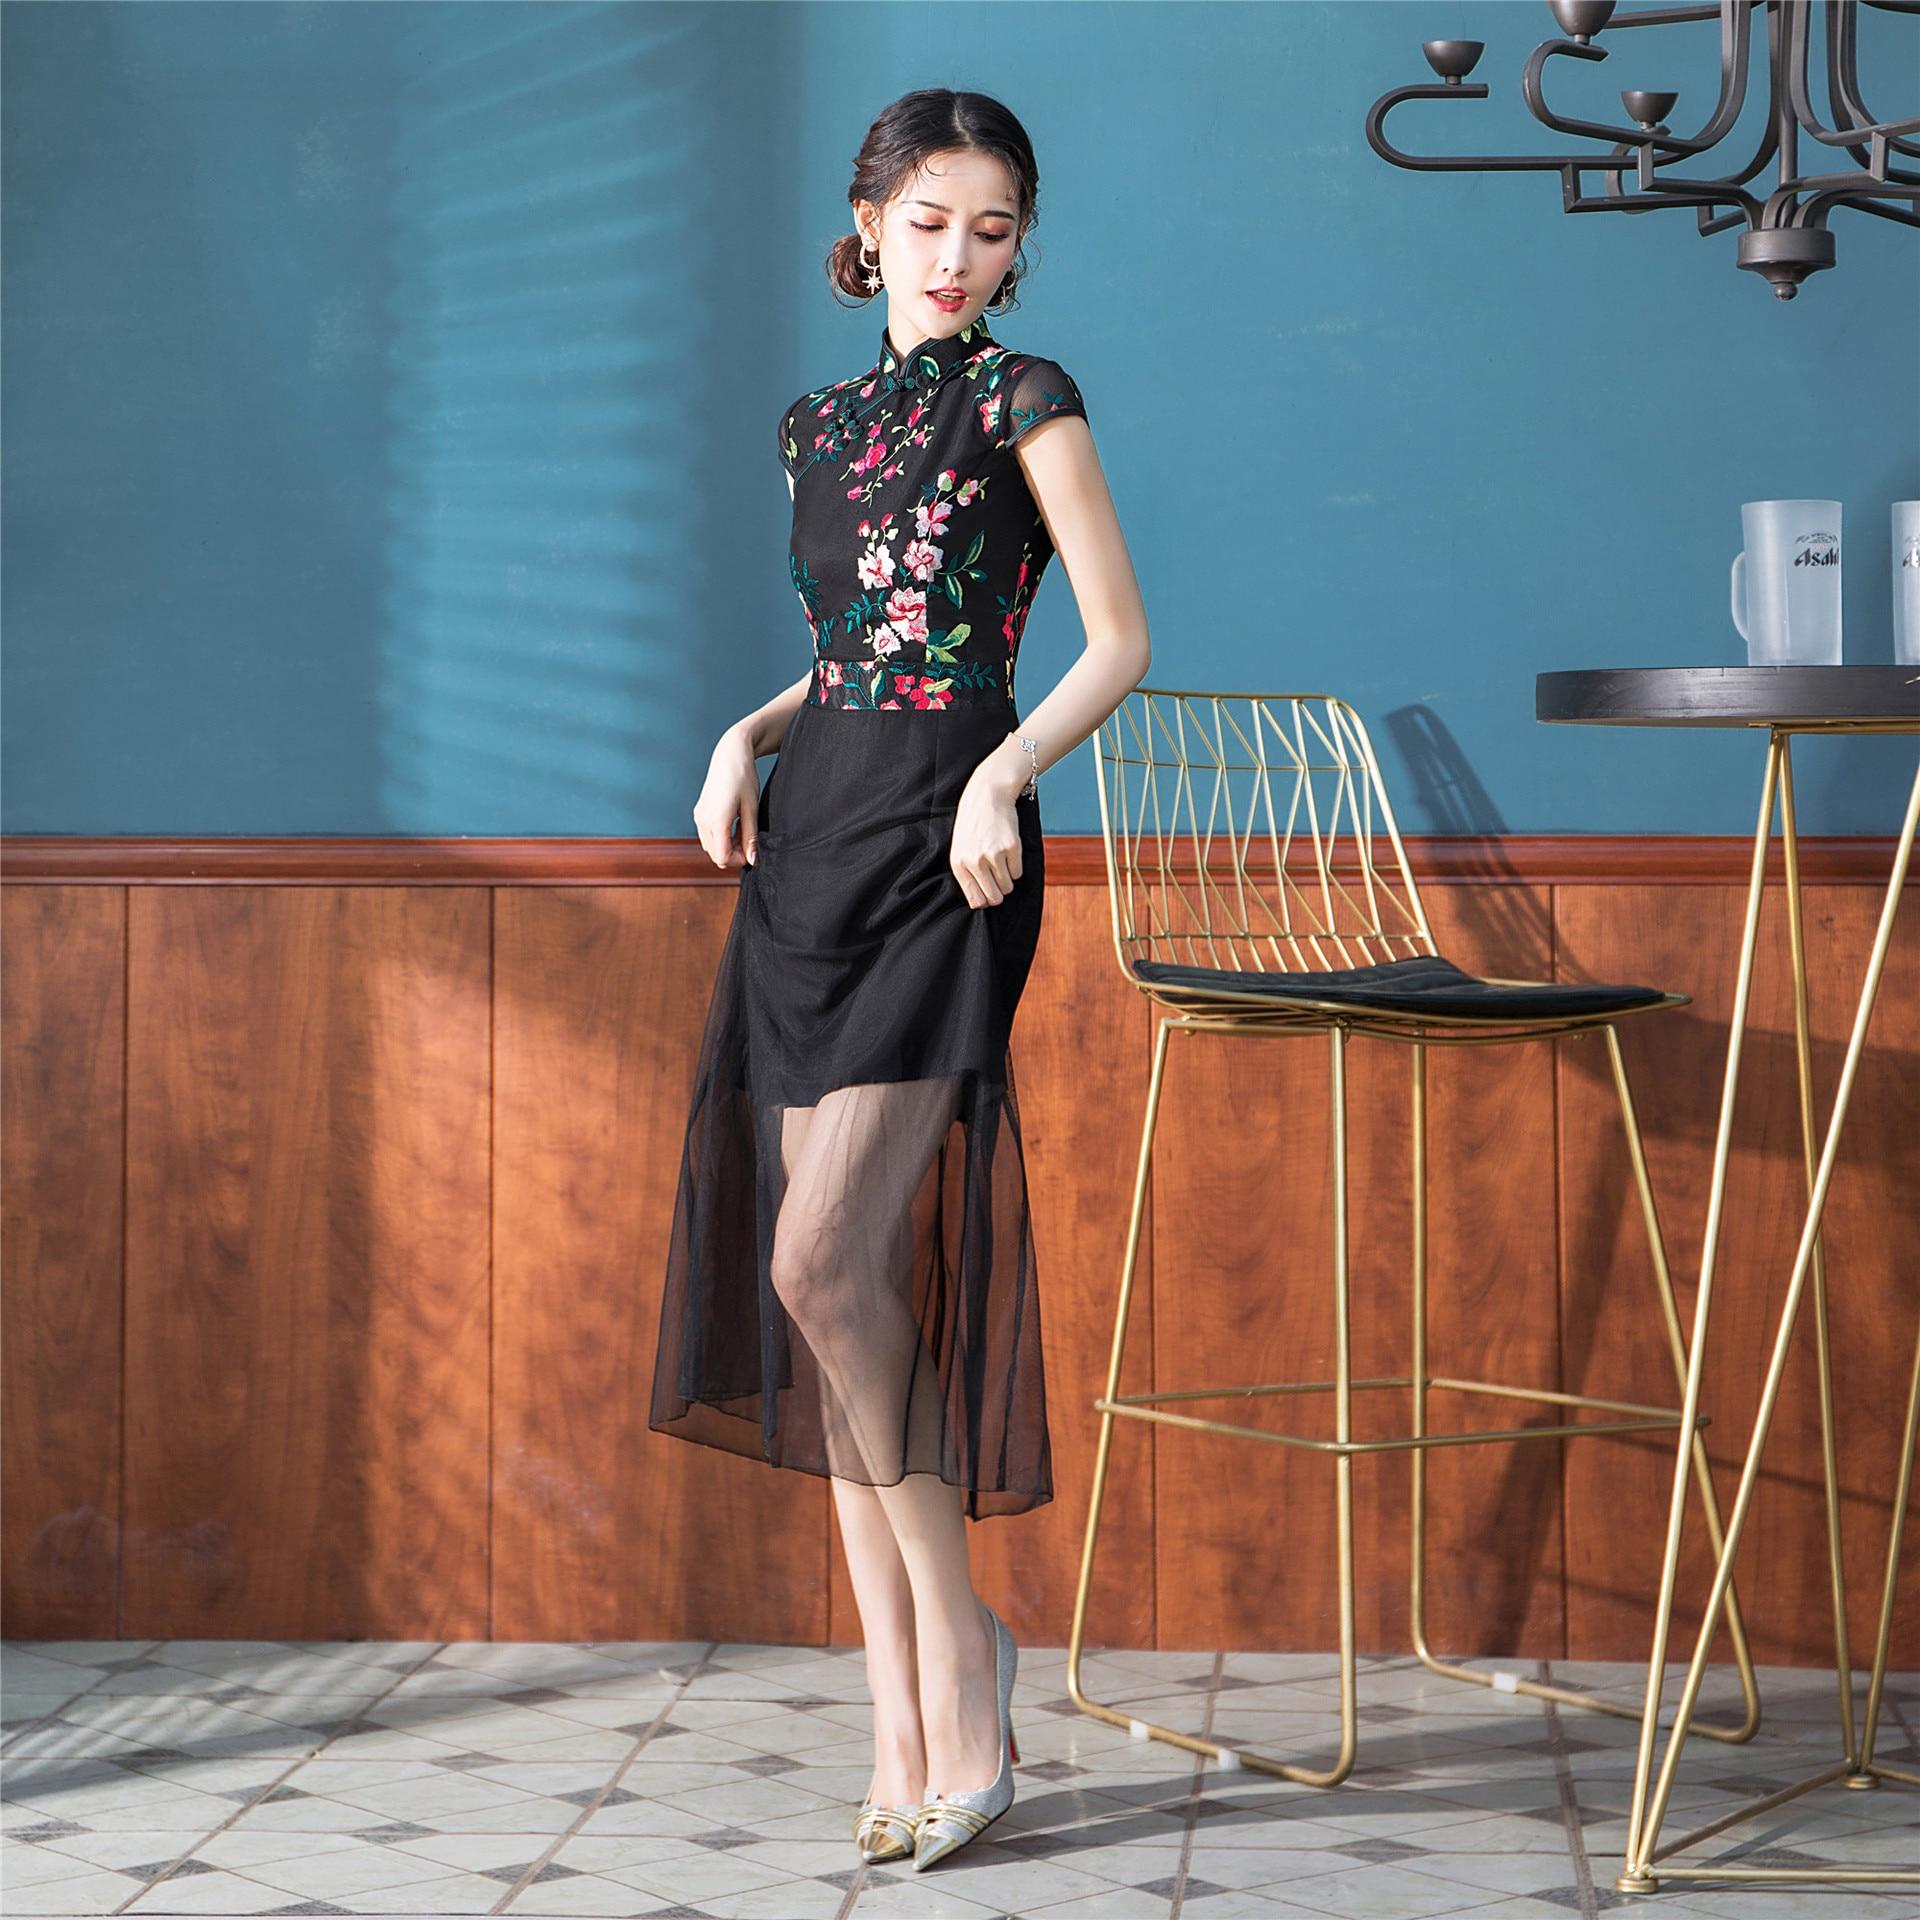 Open Rain 2019 Spring Origional New Style Embroidered Few Sha A- Line Skirt Black GIRL'S Cheongsam Nian Qing Kuan Cheongsam